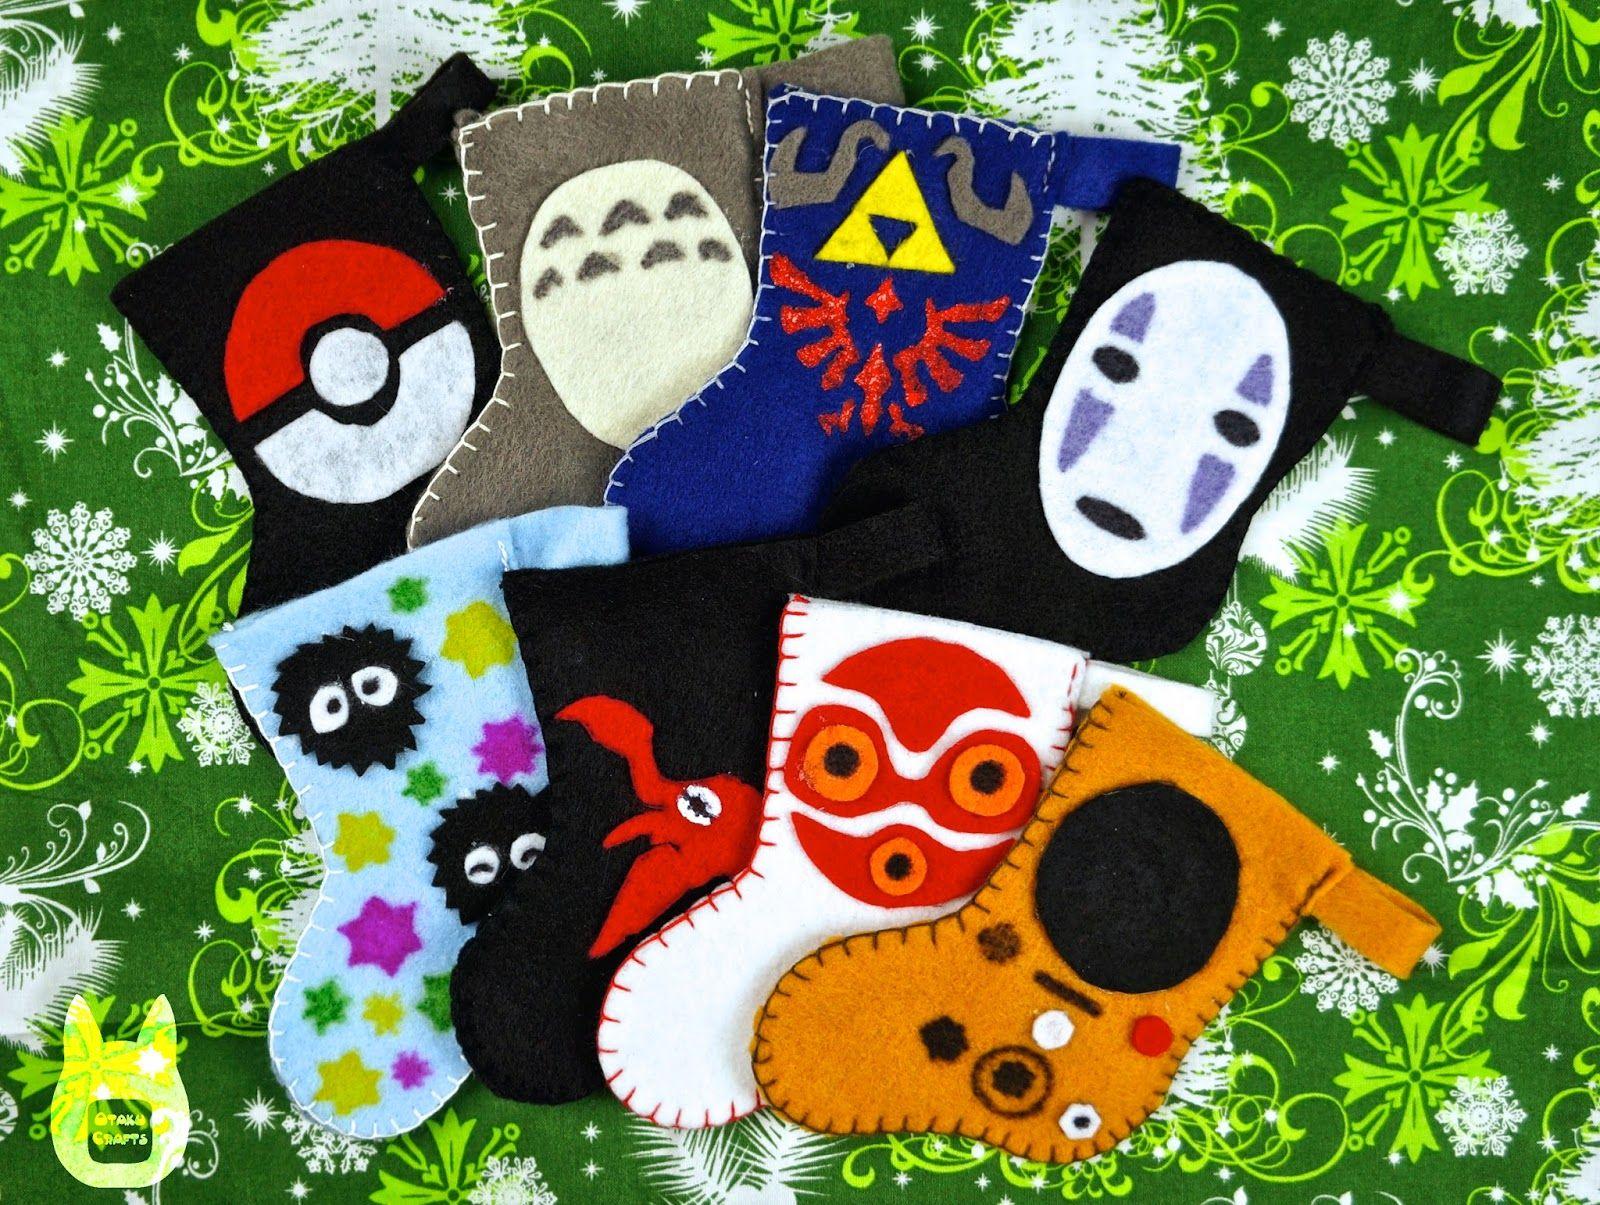 Otaku Crafts Mini Stocking Ornaments/Giftcard Holders